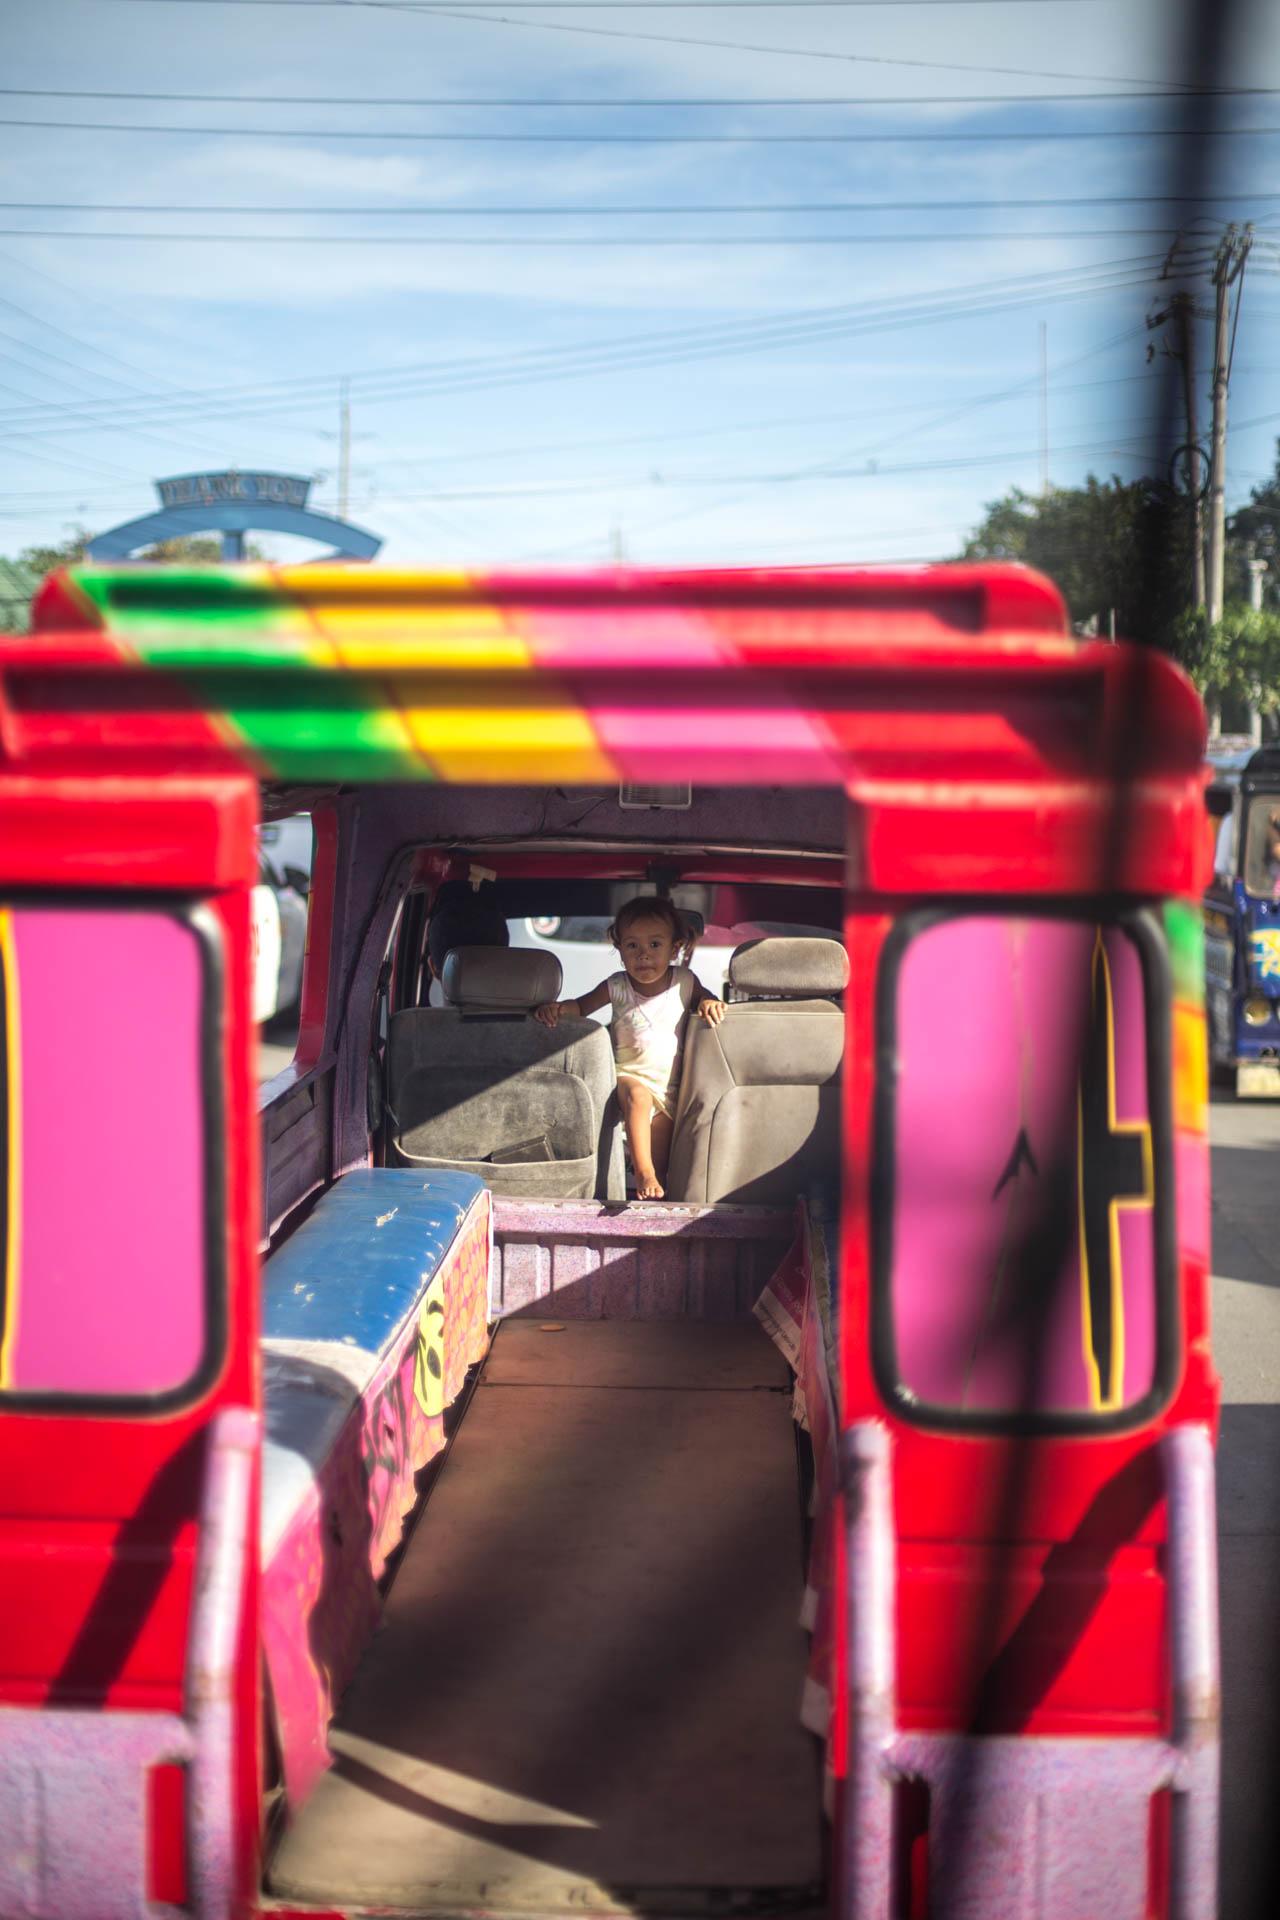 Jeepney Fahrt